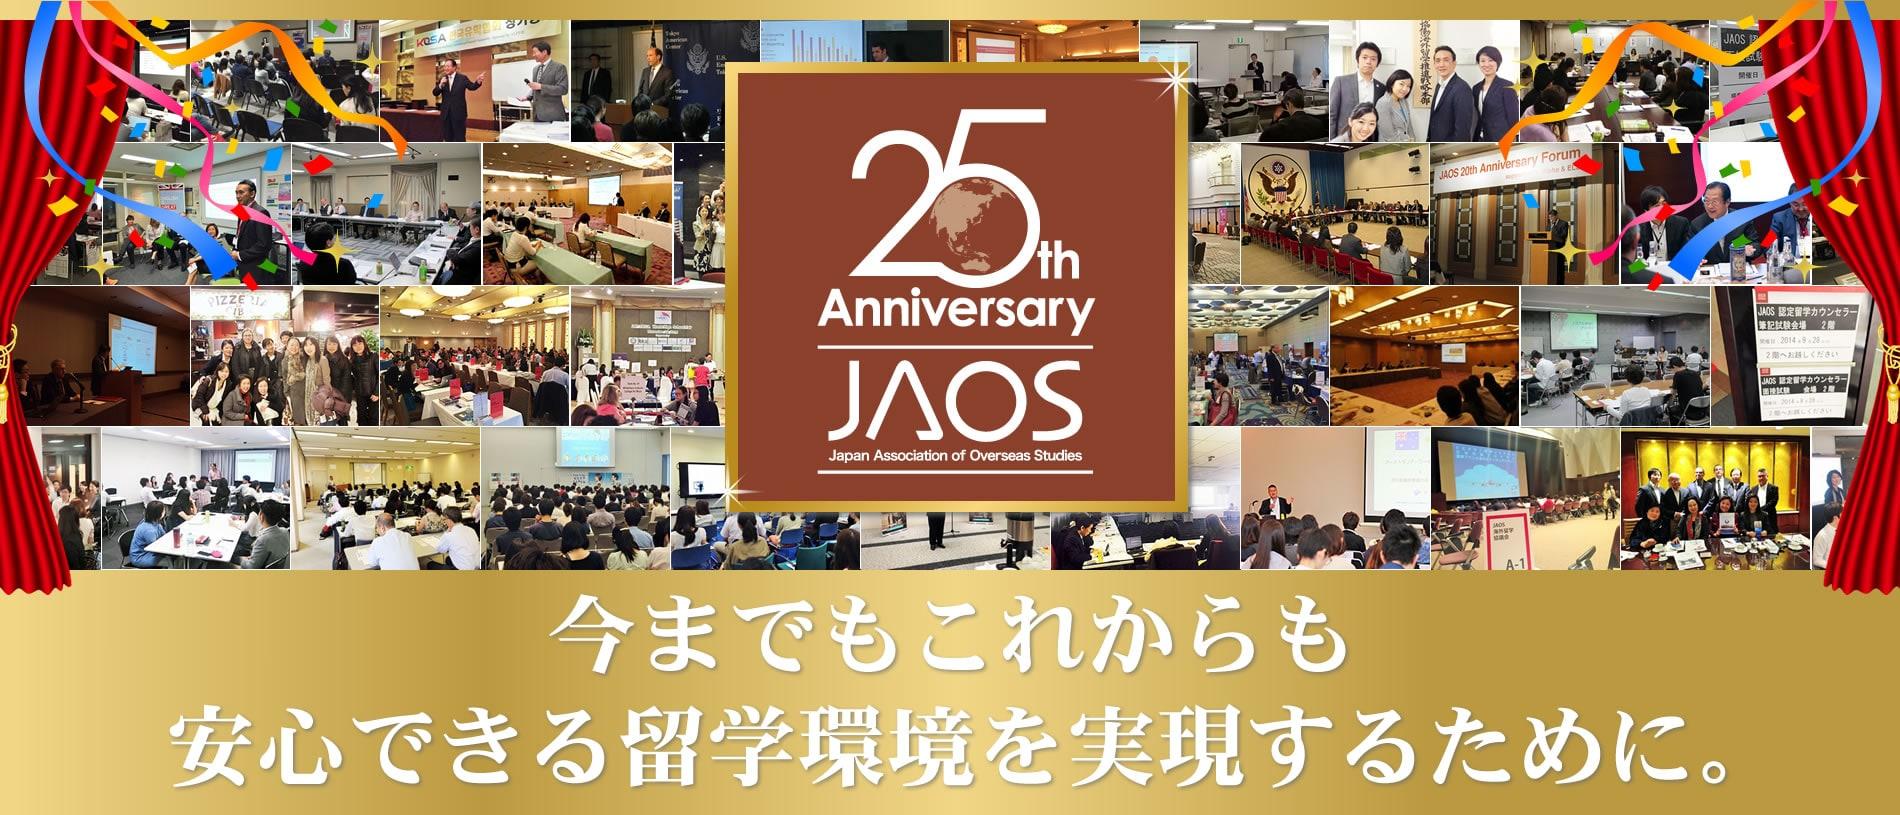 JAOS設立25周年